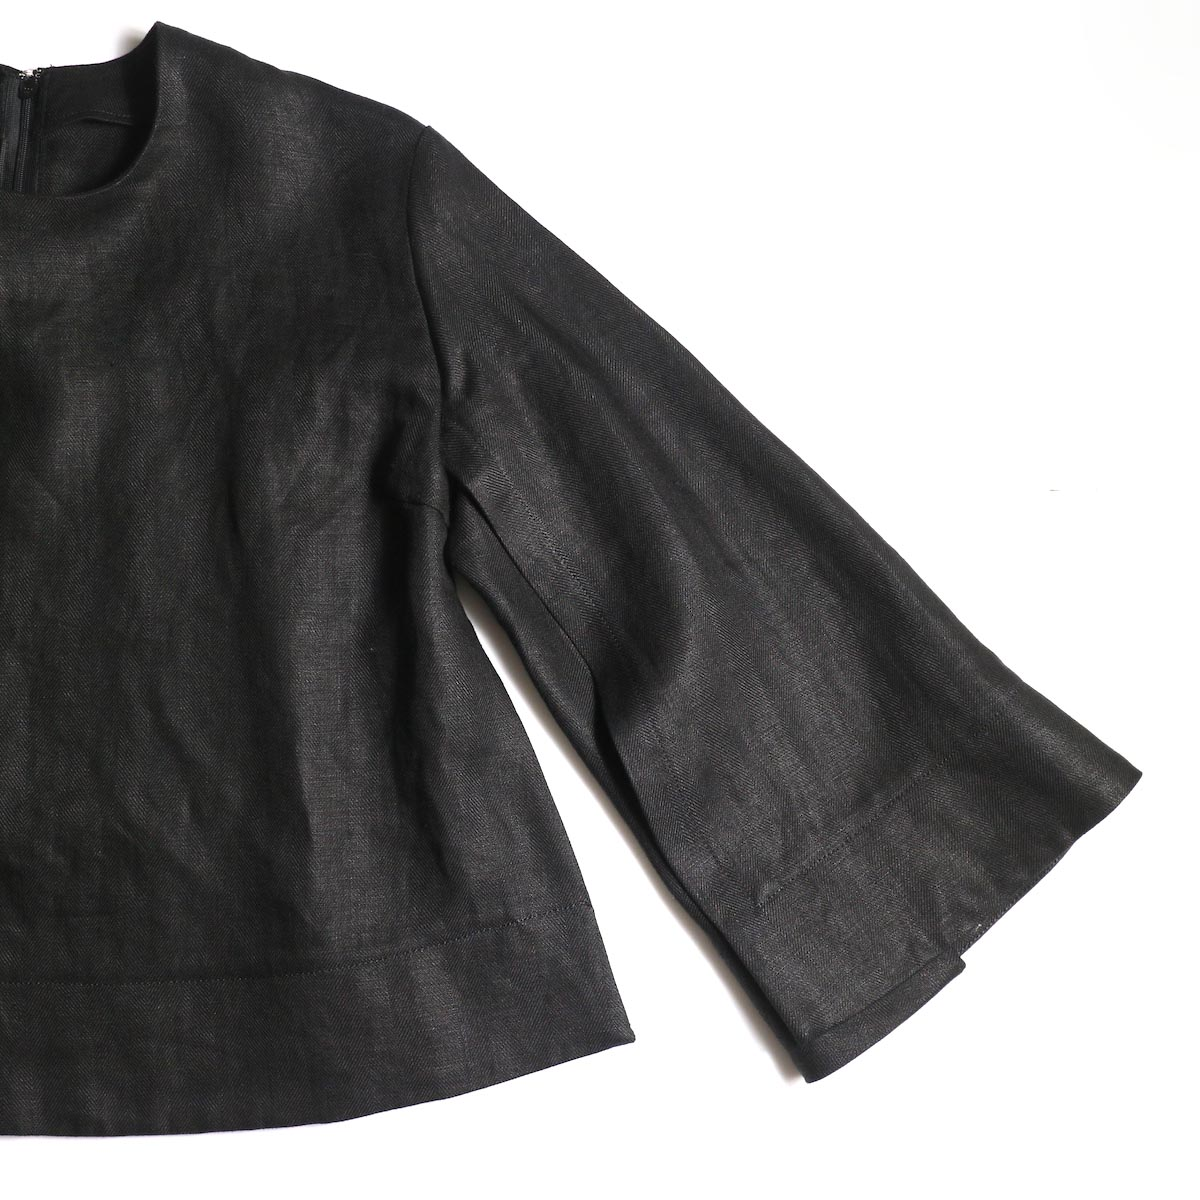 BLUEBIRD BOULEVARD / ヘリンボンリネンプルオーバー (Black)袖